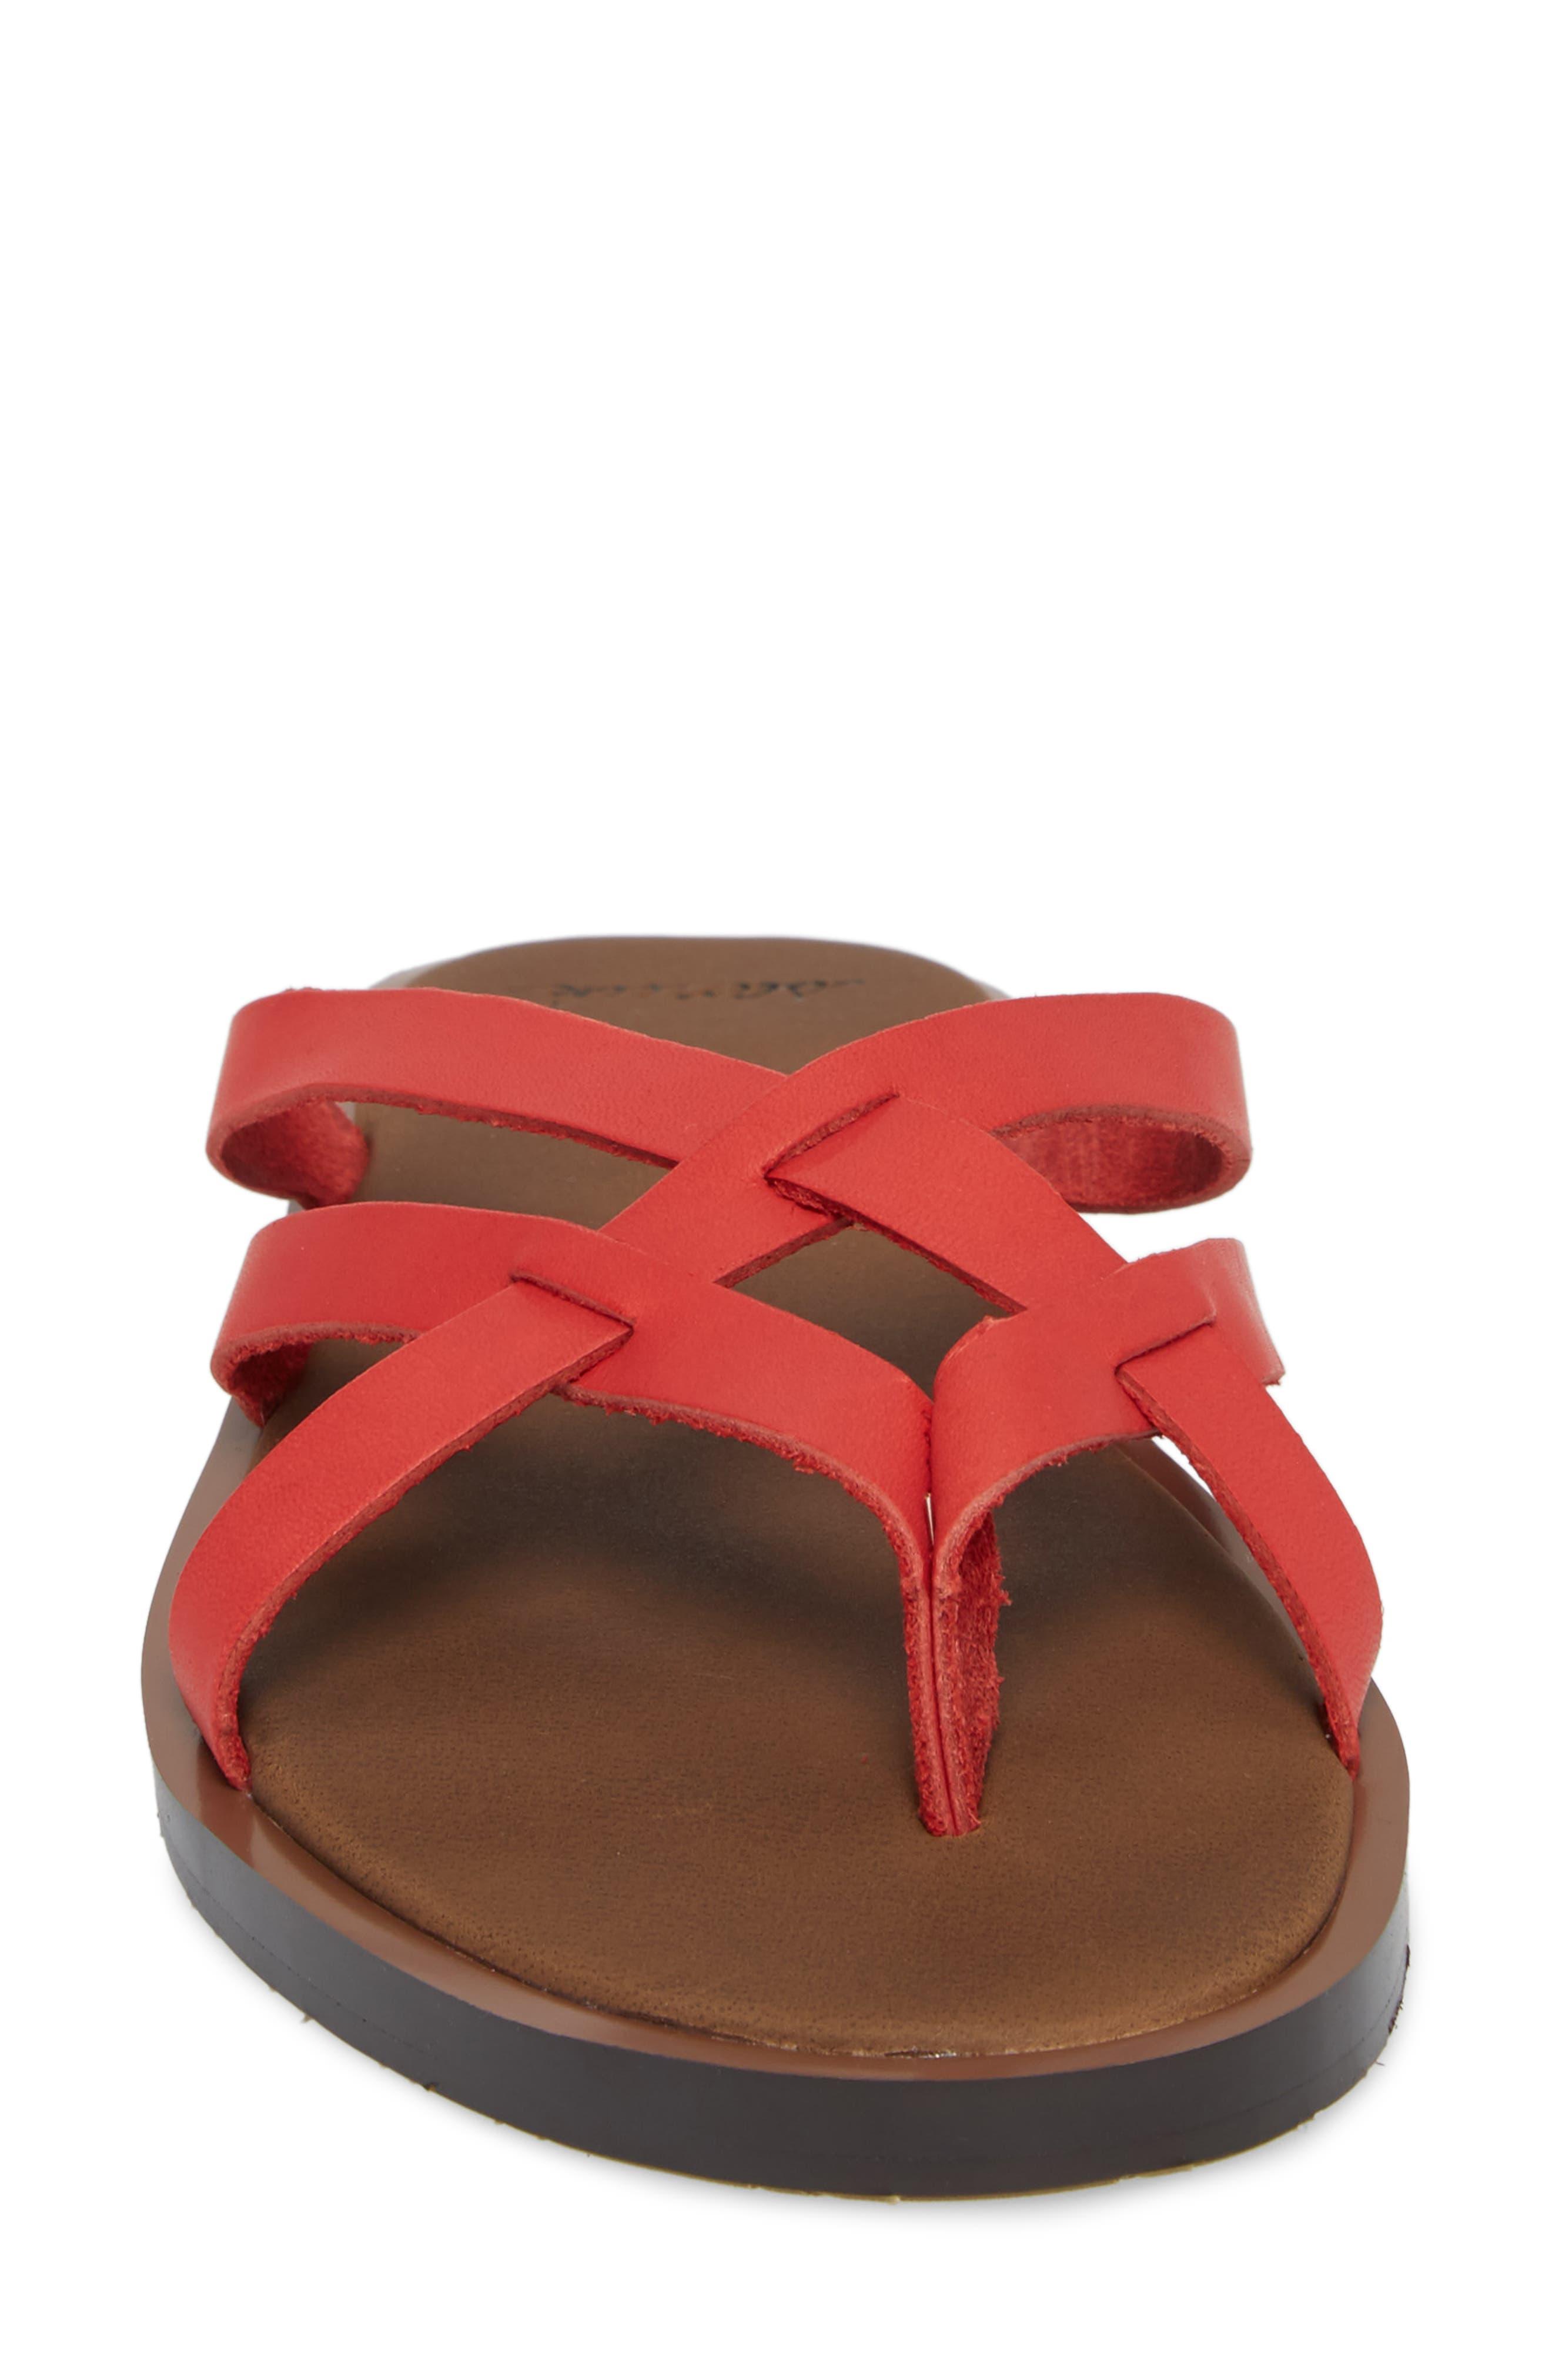 Yoga Strappy Thong Sandal,                             Alternate thumbnail 12, color,